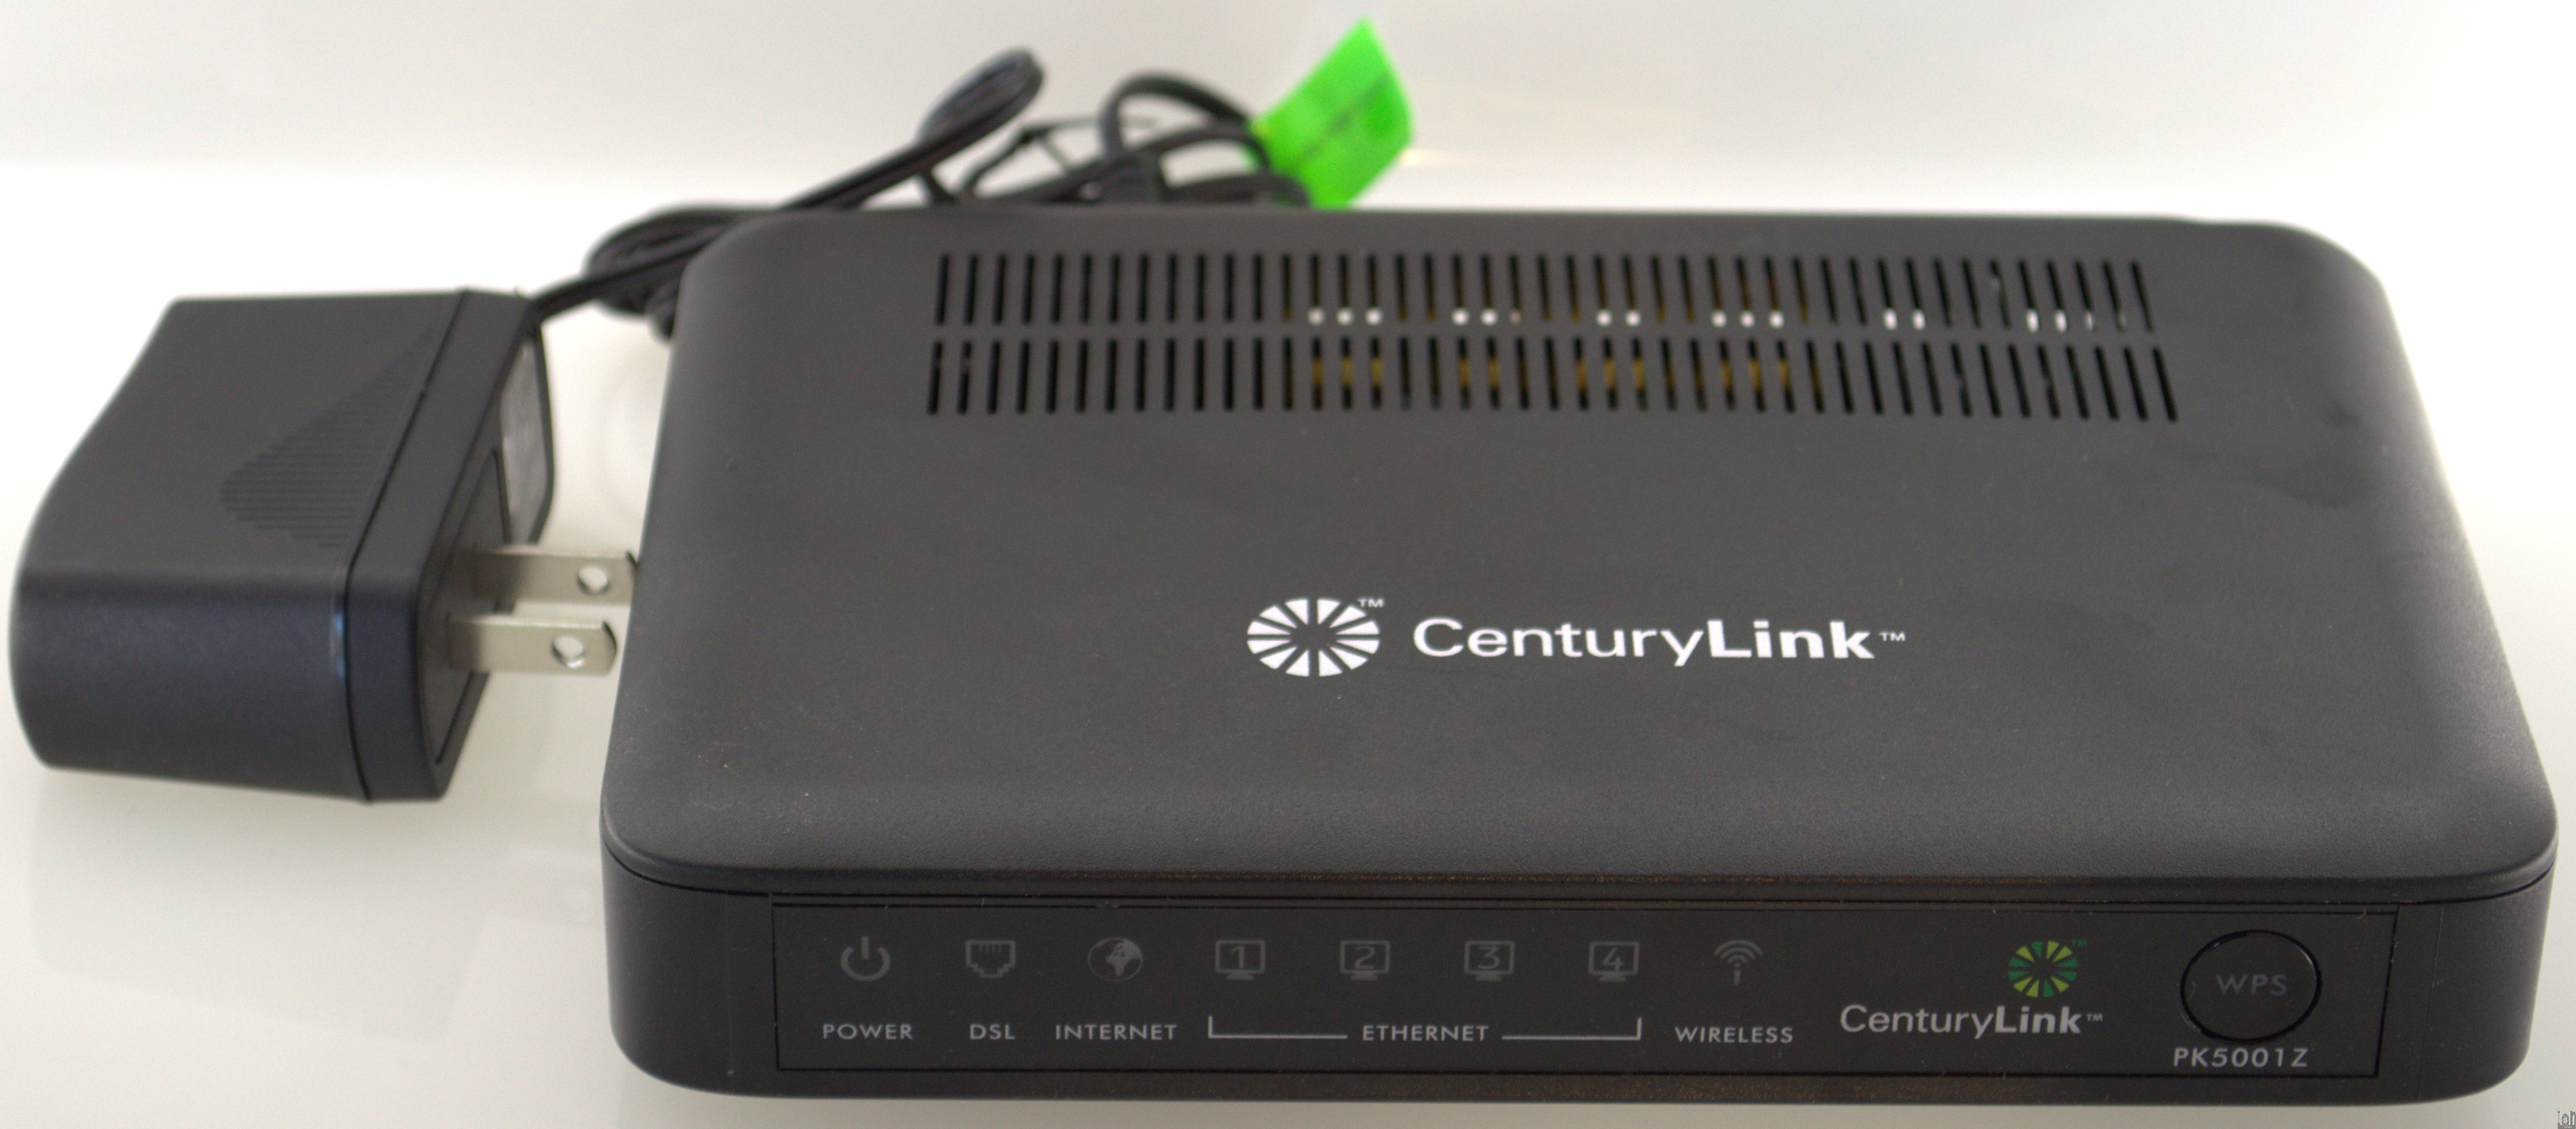 Centurylink Pk5001z Modemrouter Wireless Wifi Used No Pk5001a Modem Wiring Diagram Actiontec C1000a Picture Bridge Mode